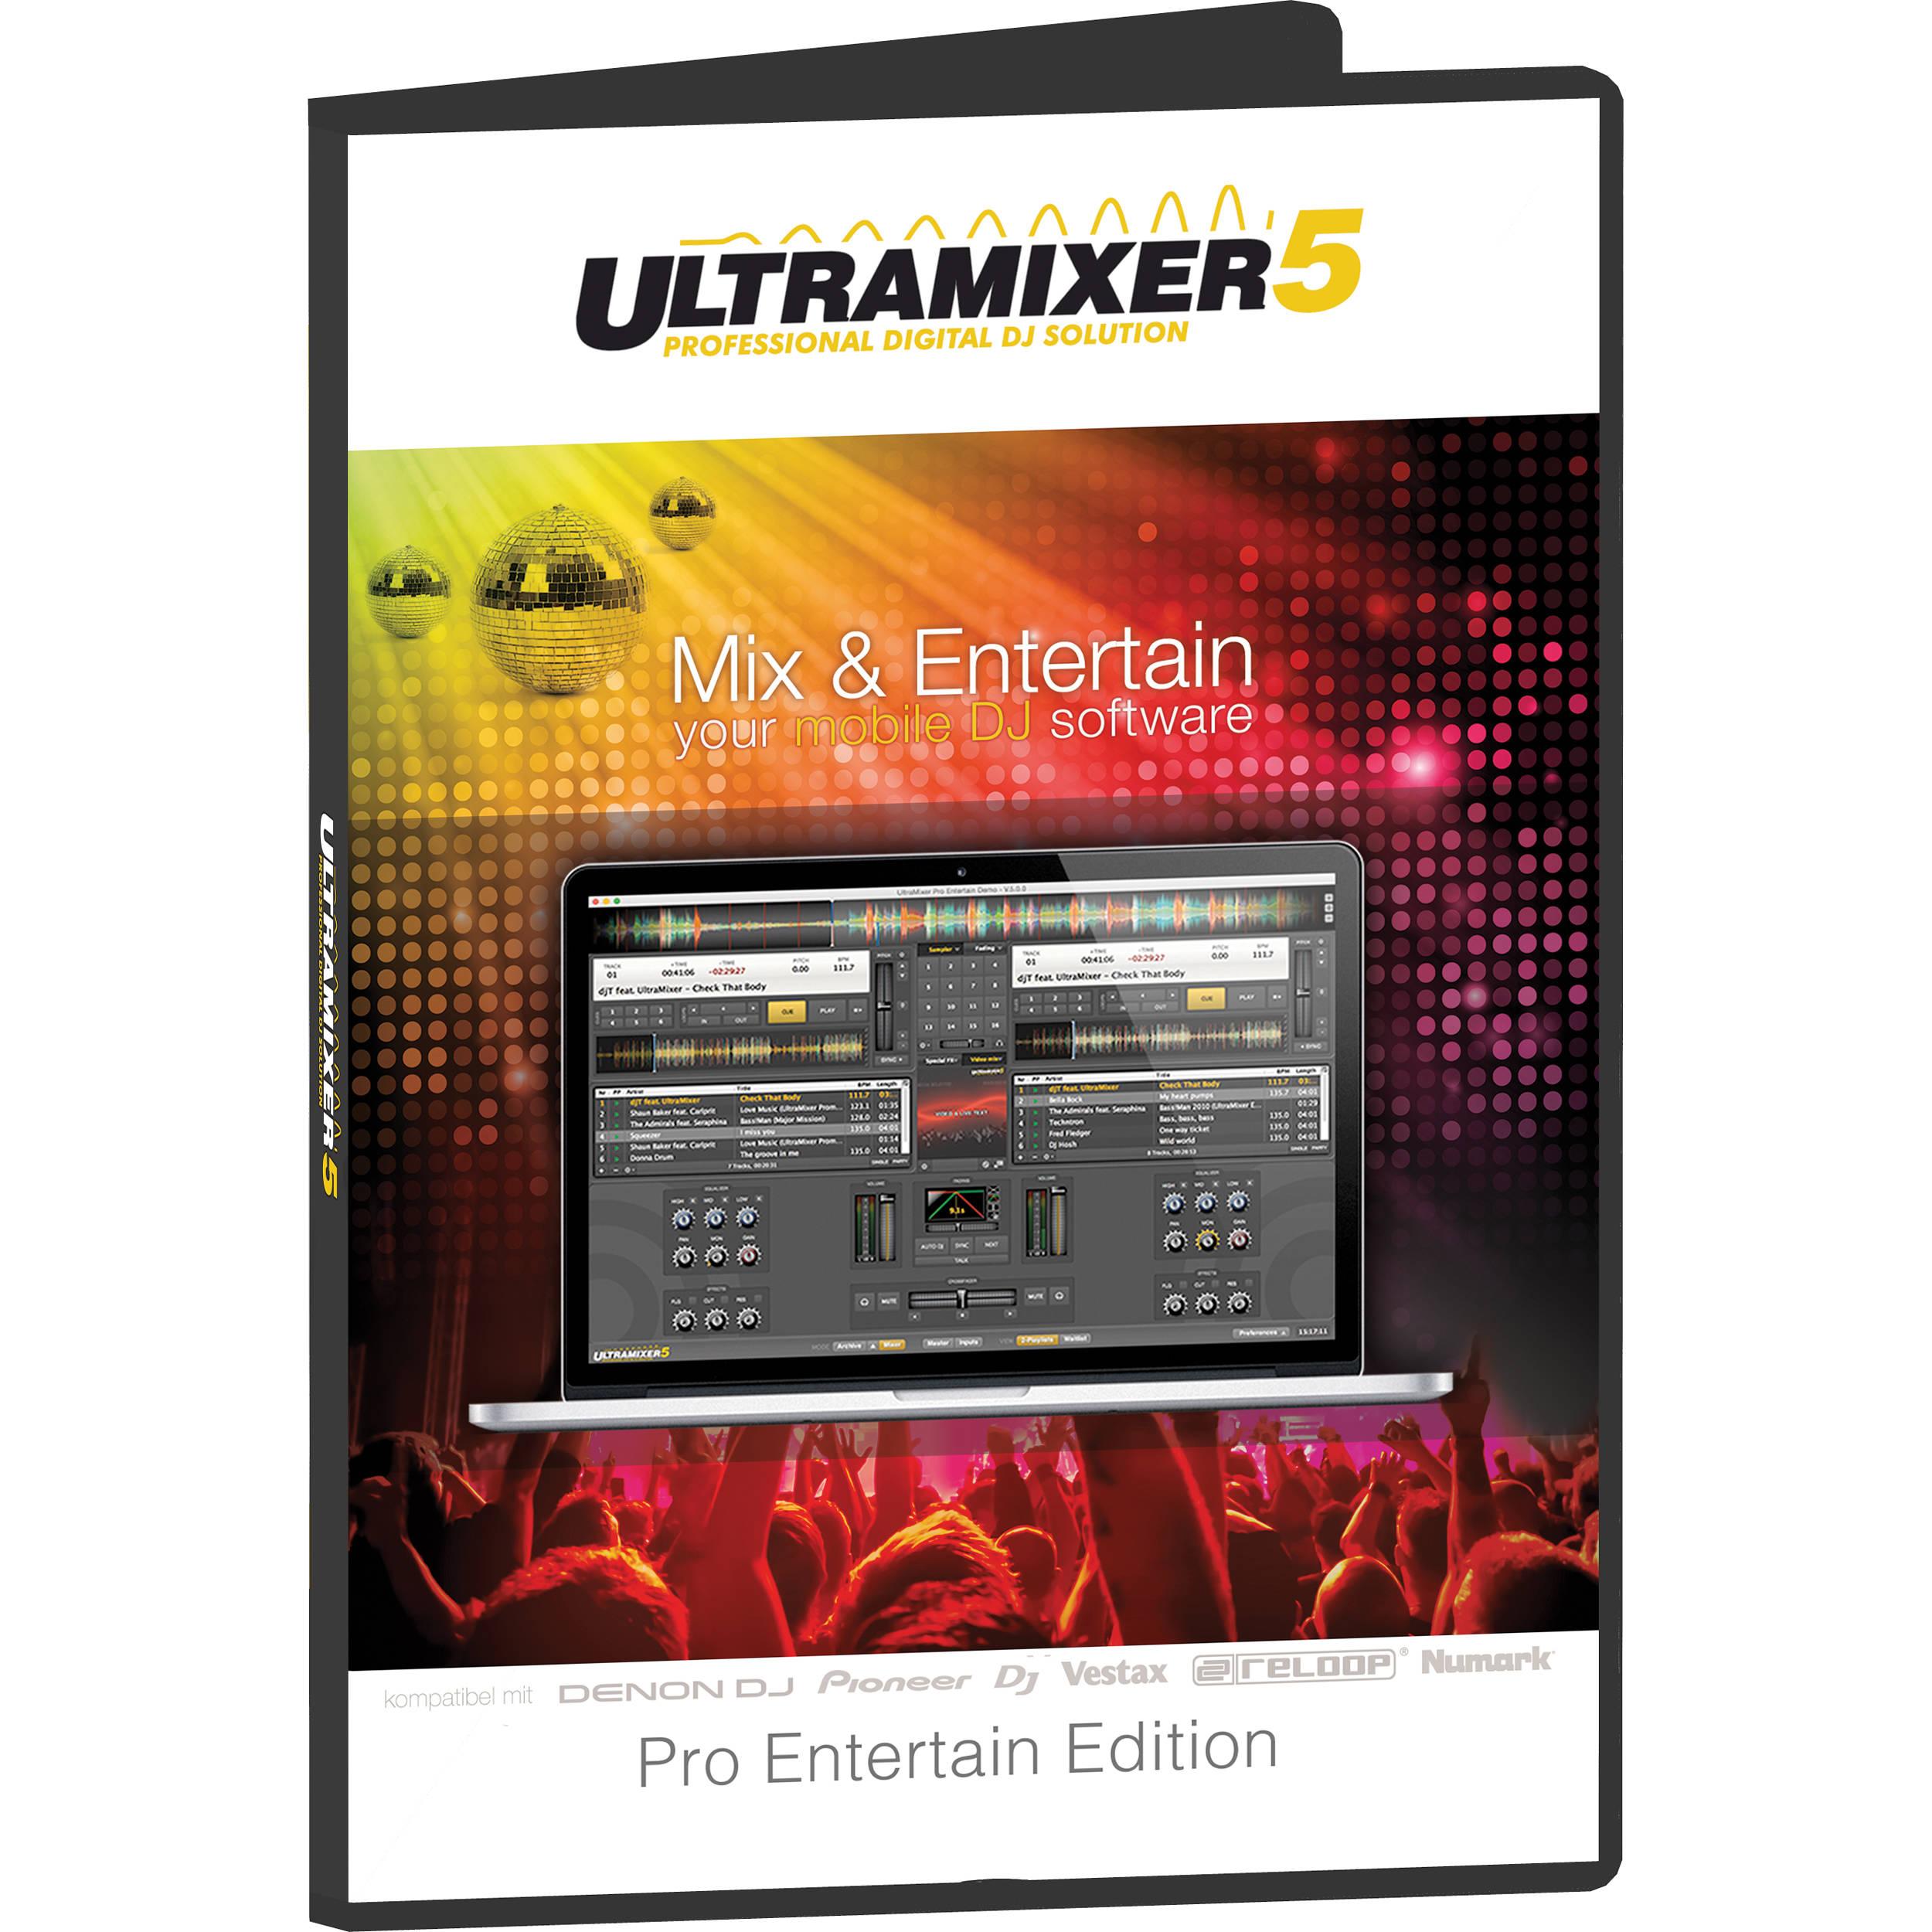 Ultramixer UltraMixer 5 Pro Entertain